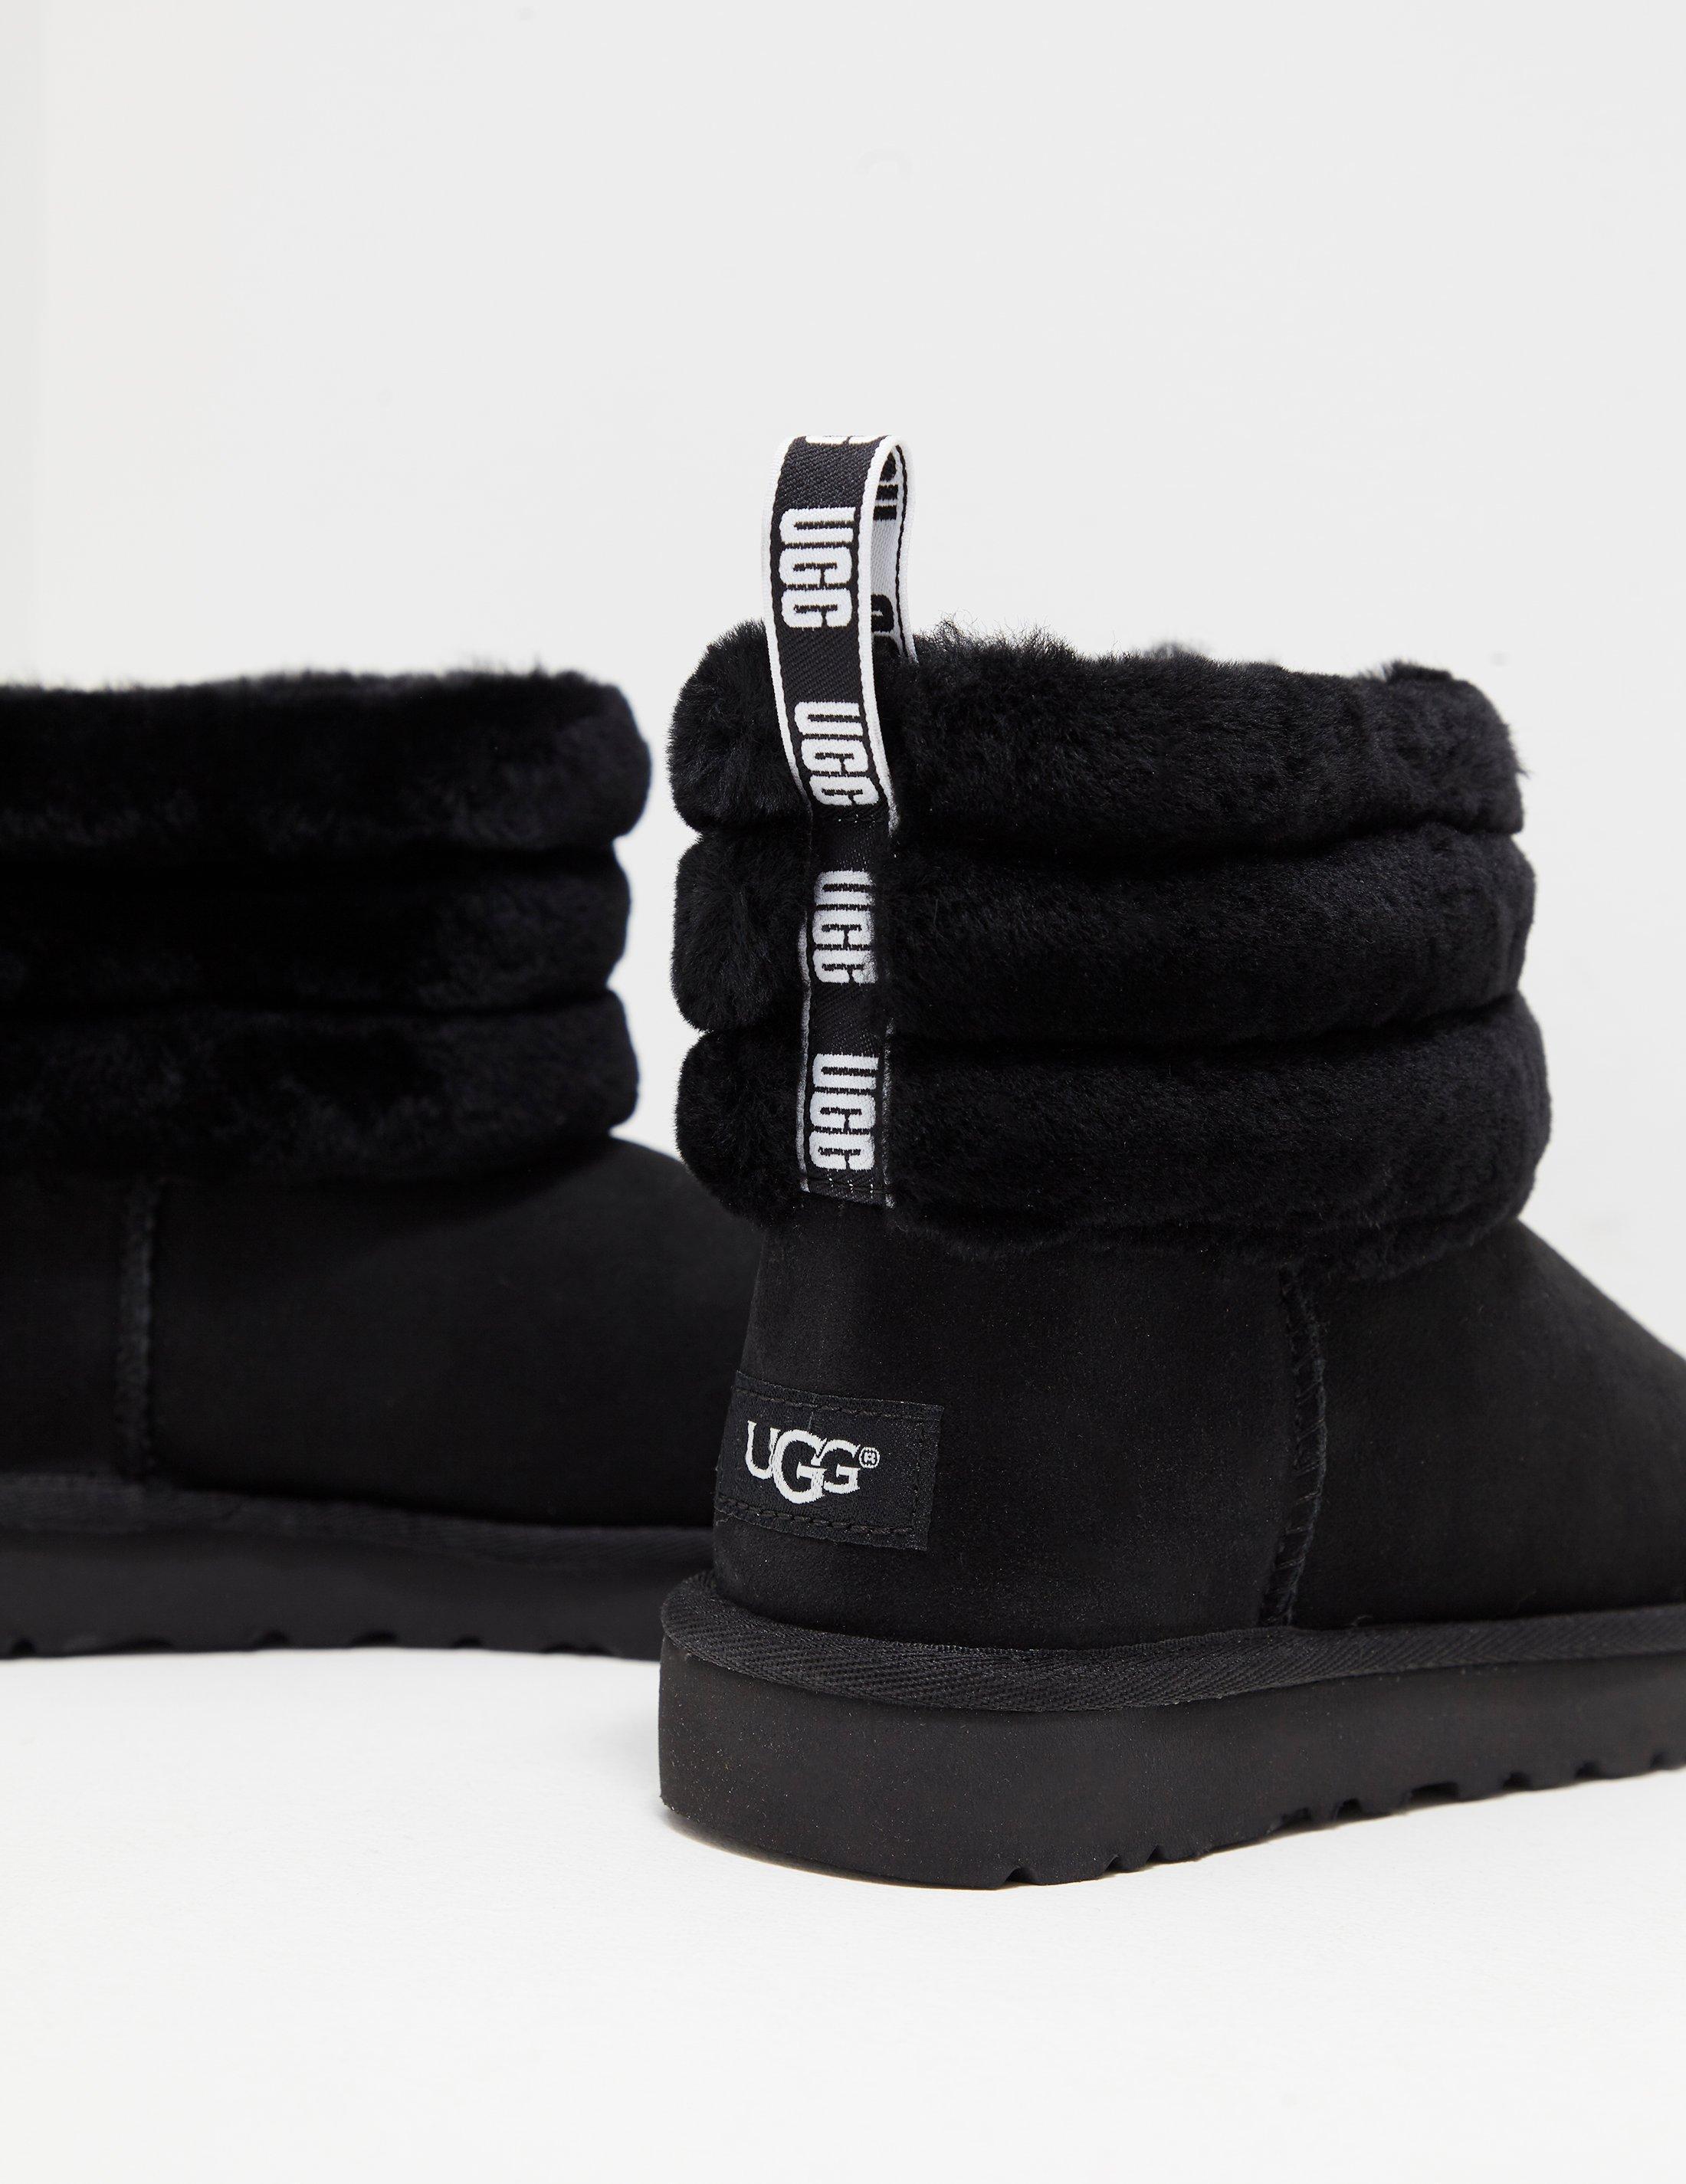 39feb21671f Ugg Womens Fluff Mini Quilted Logo Boots Women's Black